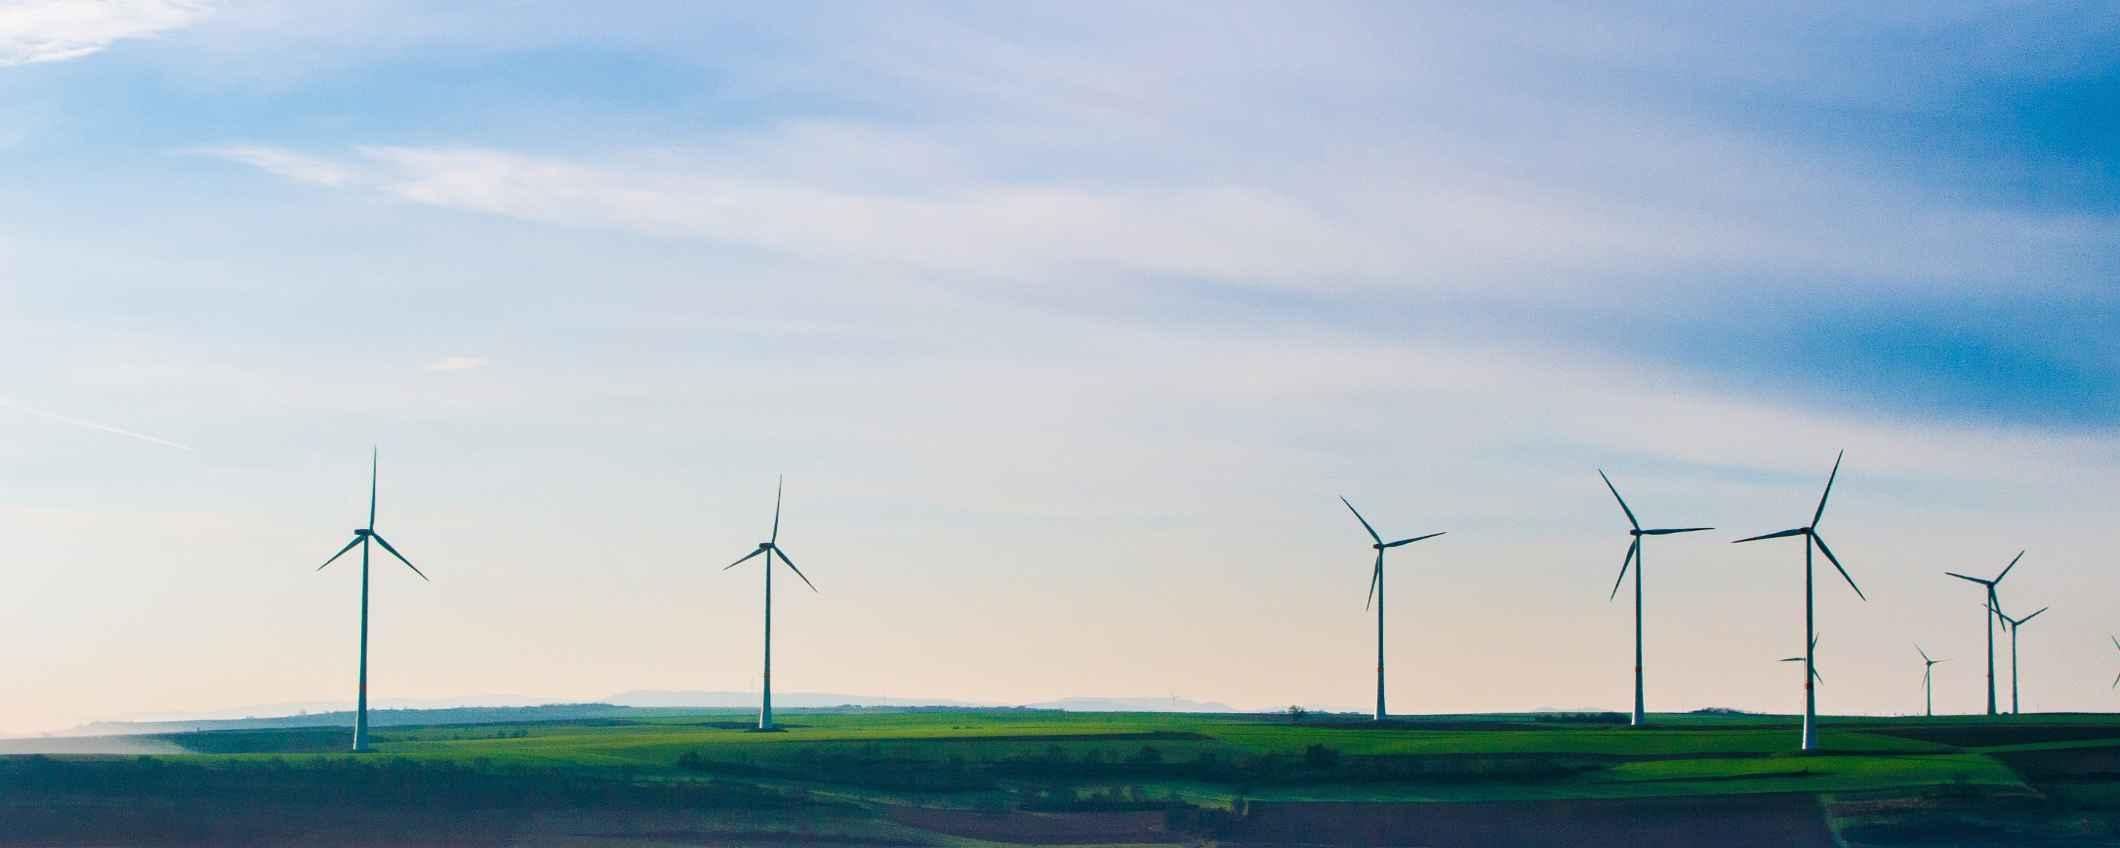 wind energy park